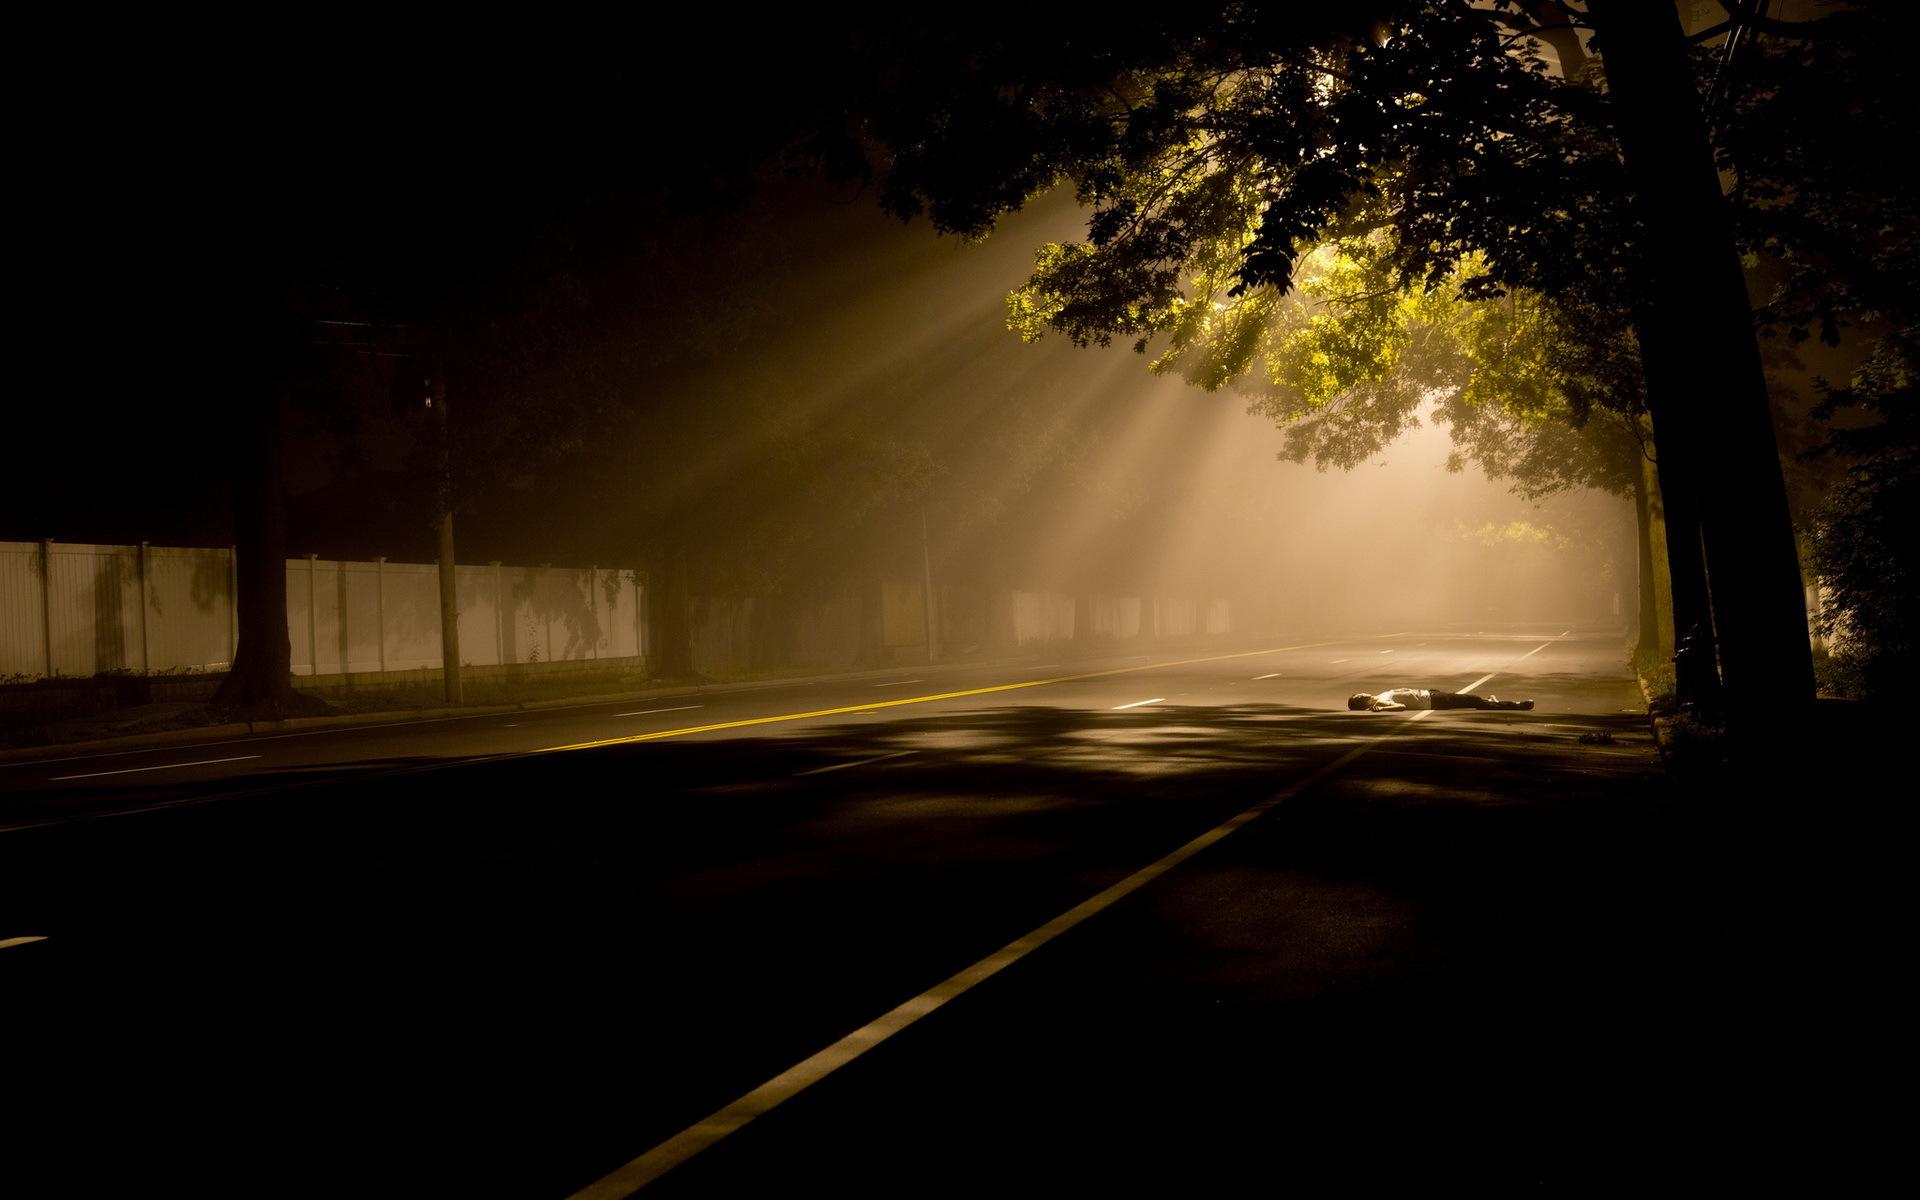 Франция дороги ночь фонари  № 2229257 бесплатно